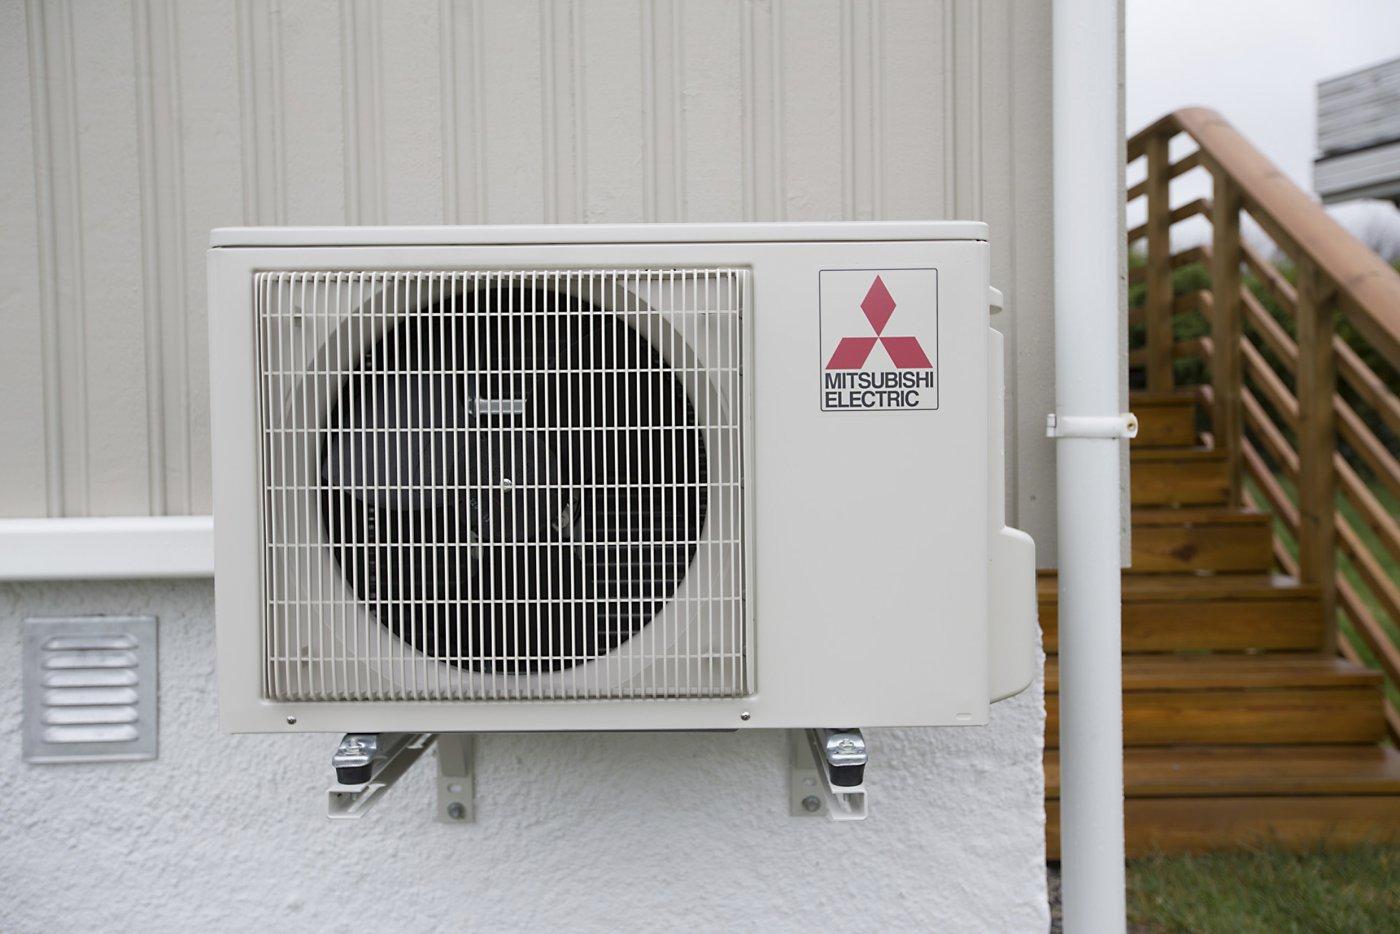 Mitsubishi varmepumpe montert på husvegg